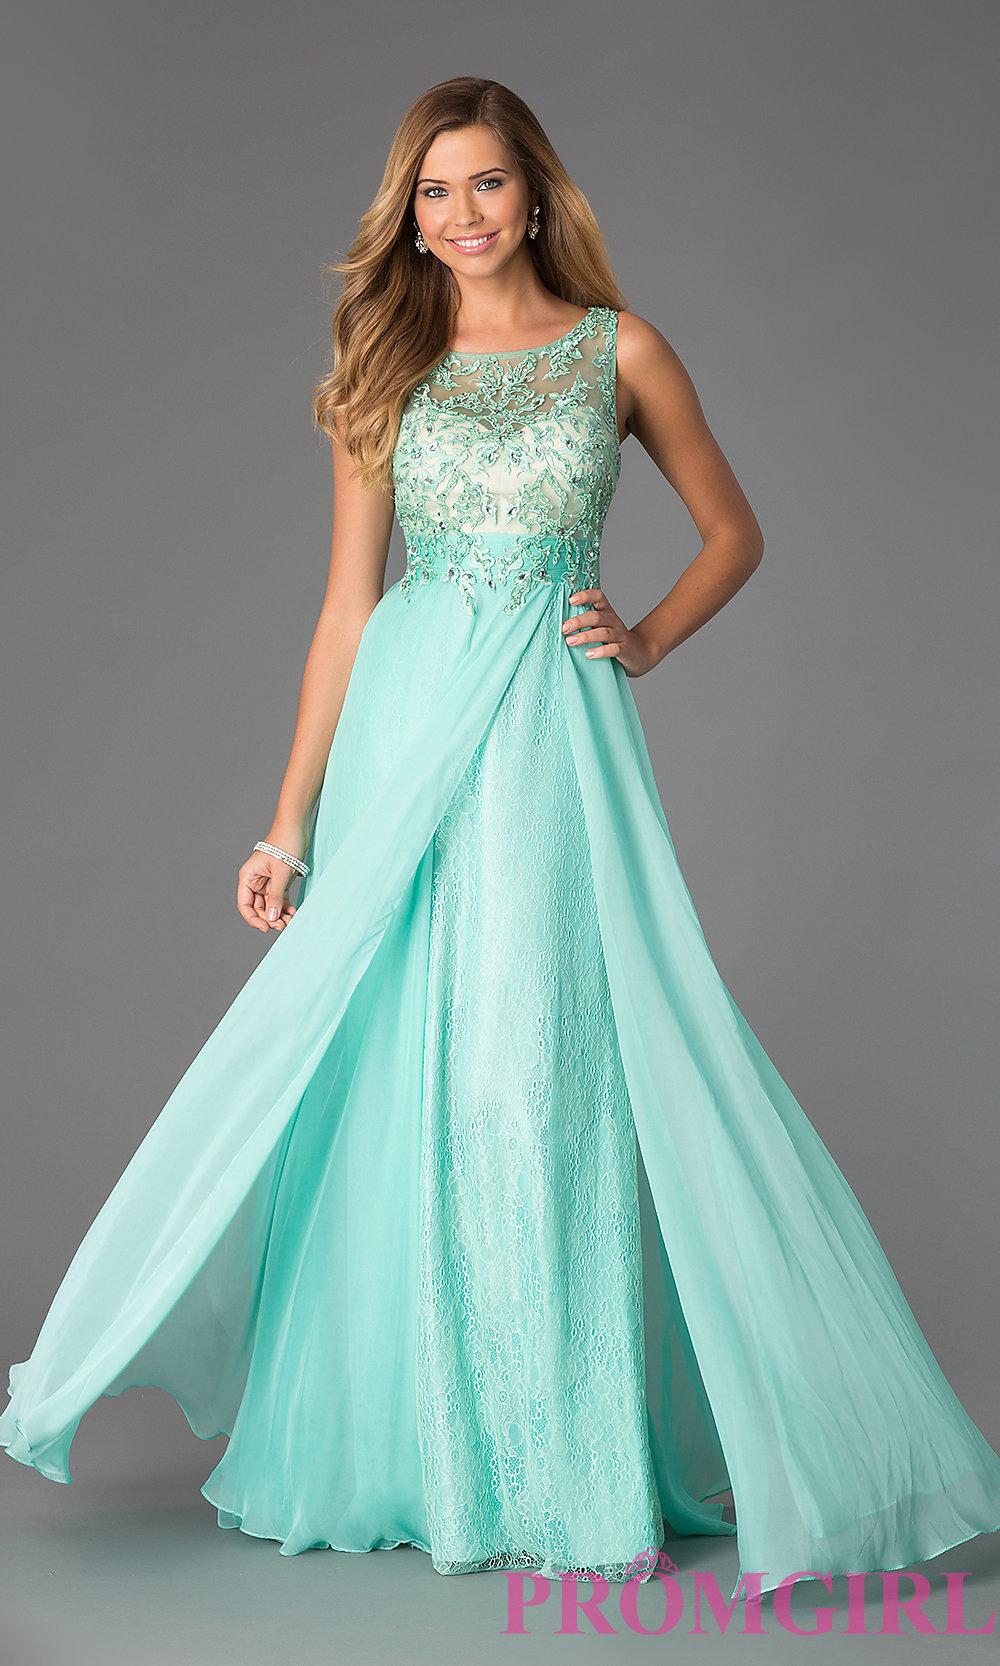 Modern Prom Dress Shops In Leeds Ensign - All Wedding Dresses ...